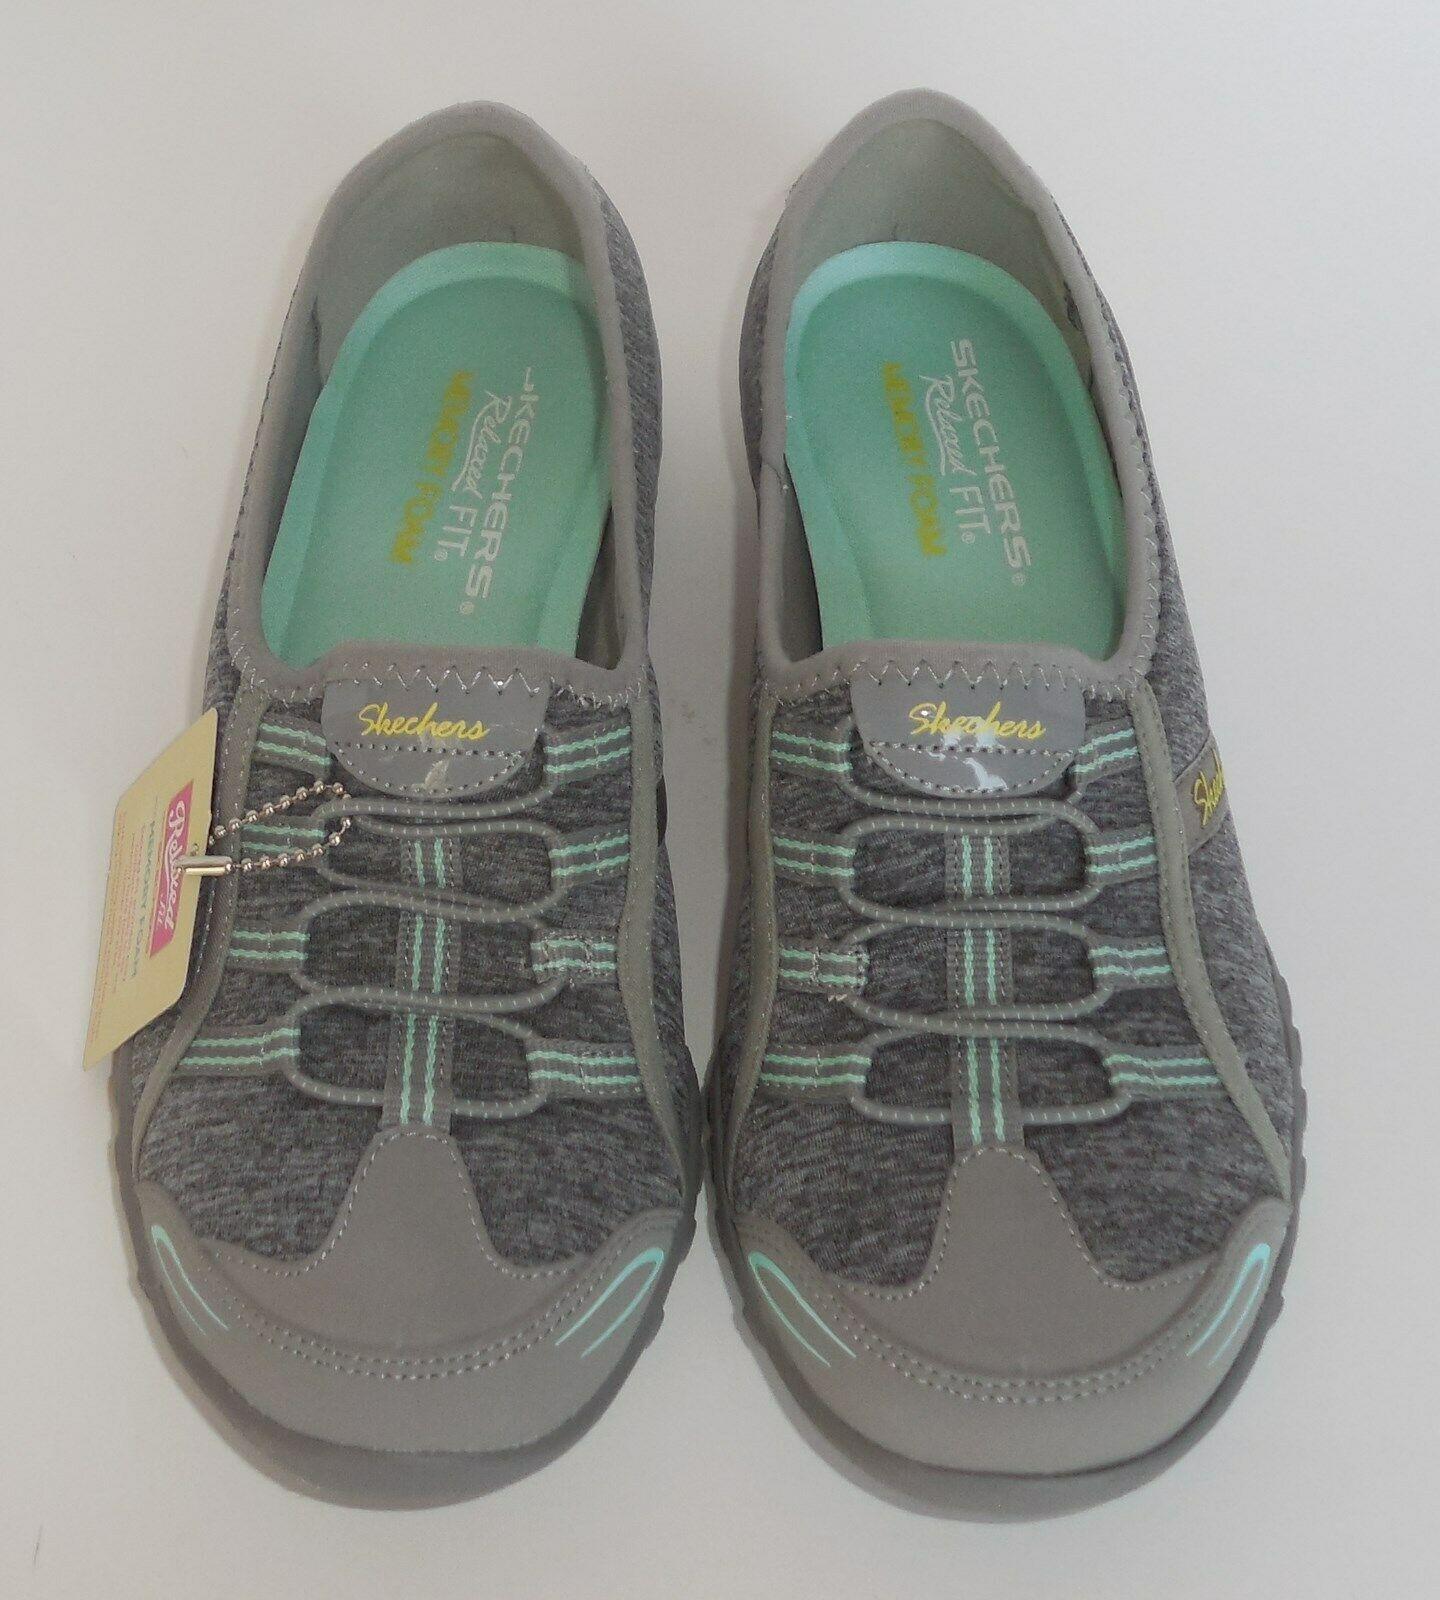 Skechers Good Life Womens 6.5 Gray Aqua Shoes Sneakers 22468 New Memory Foam